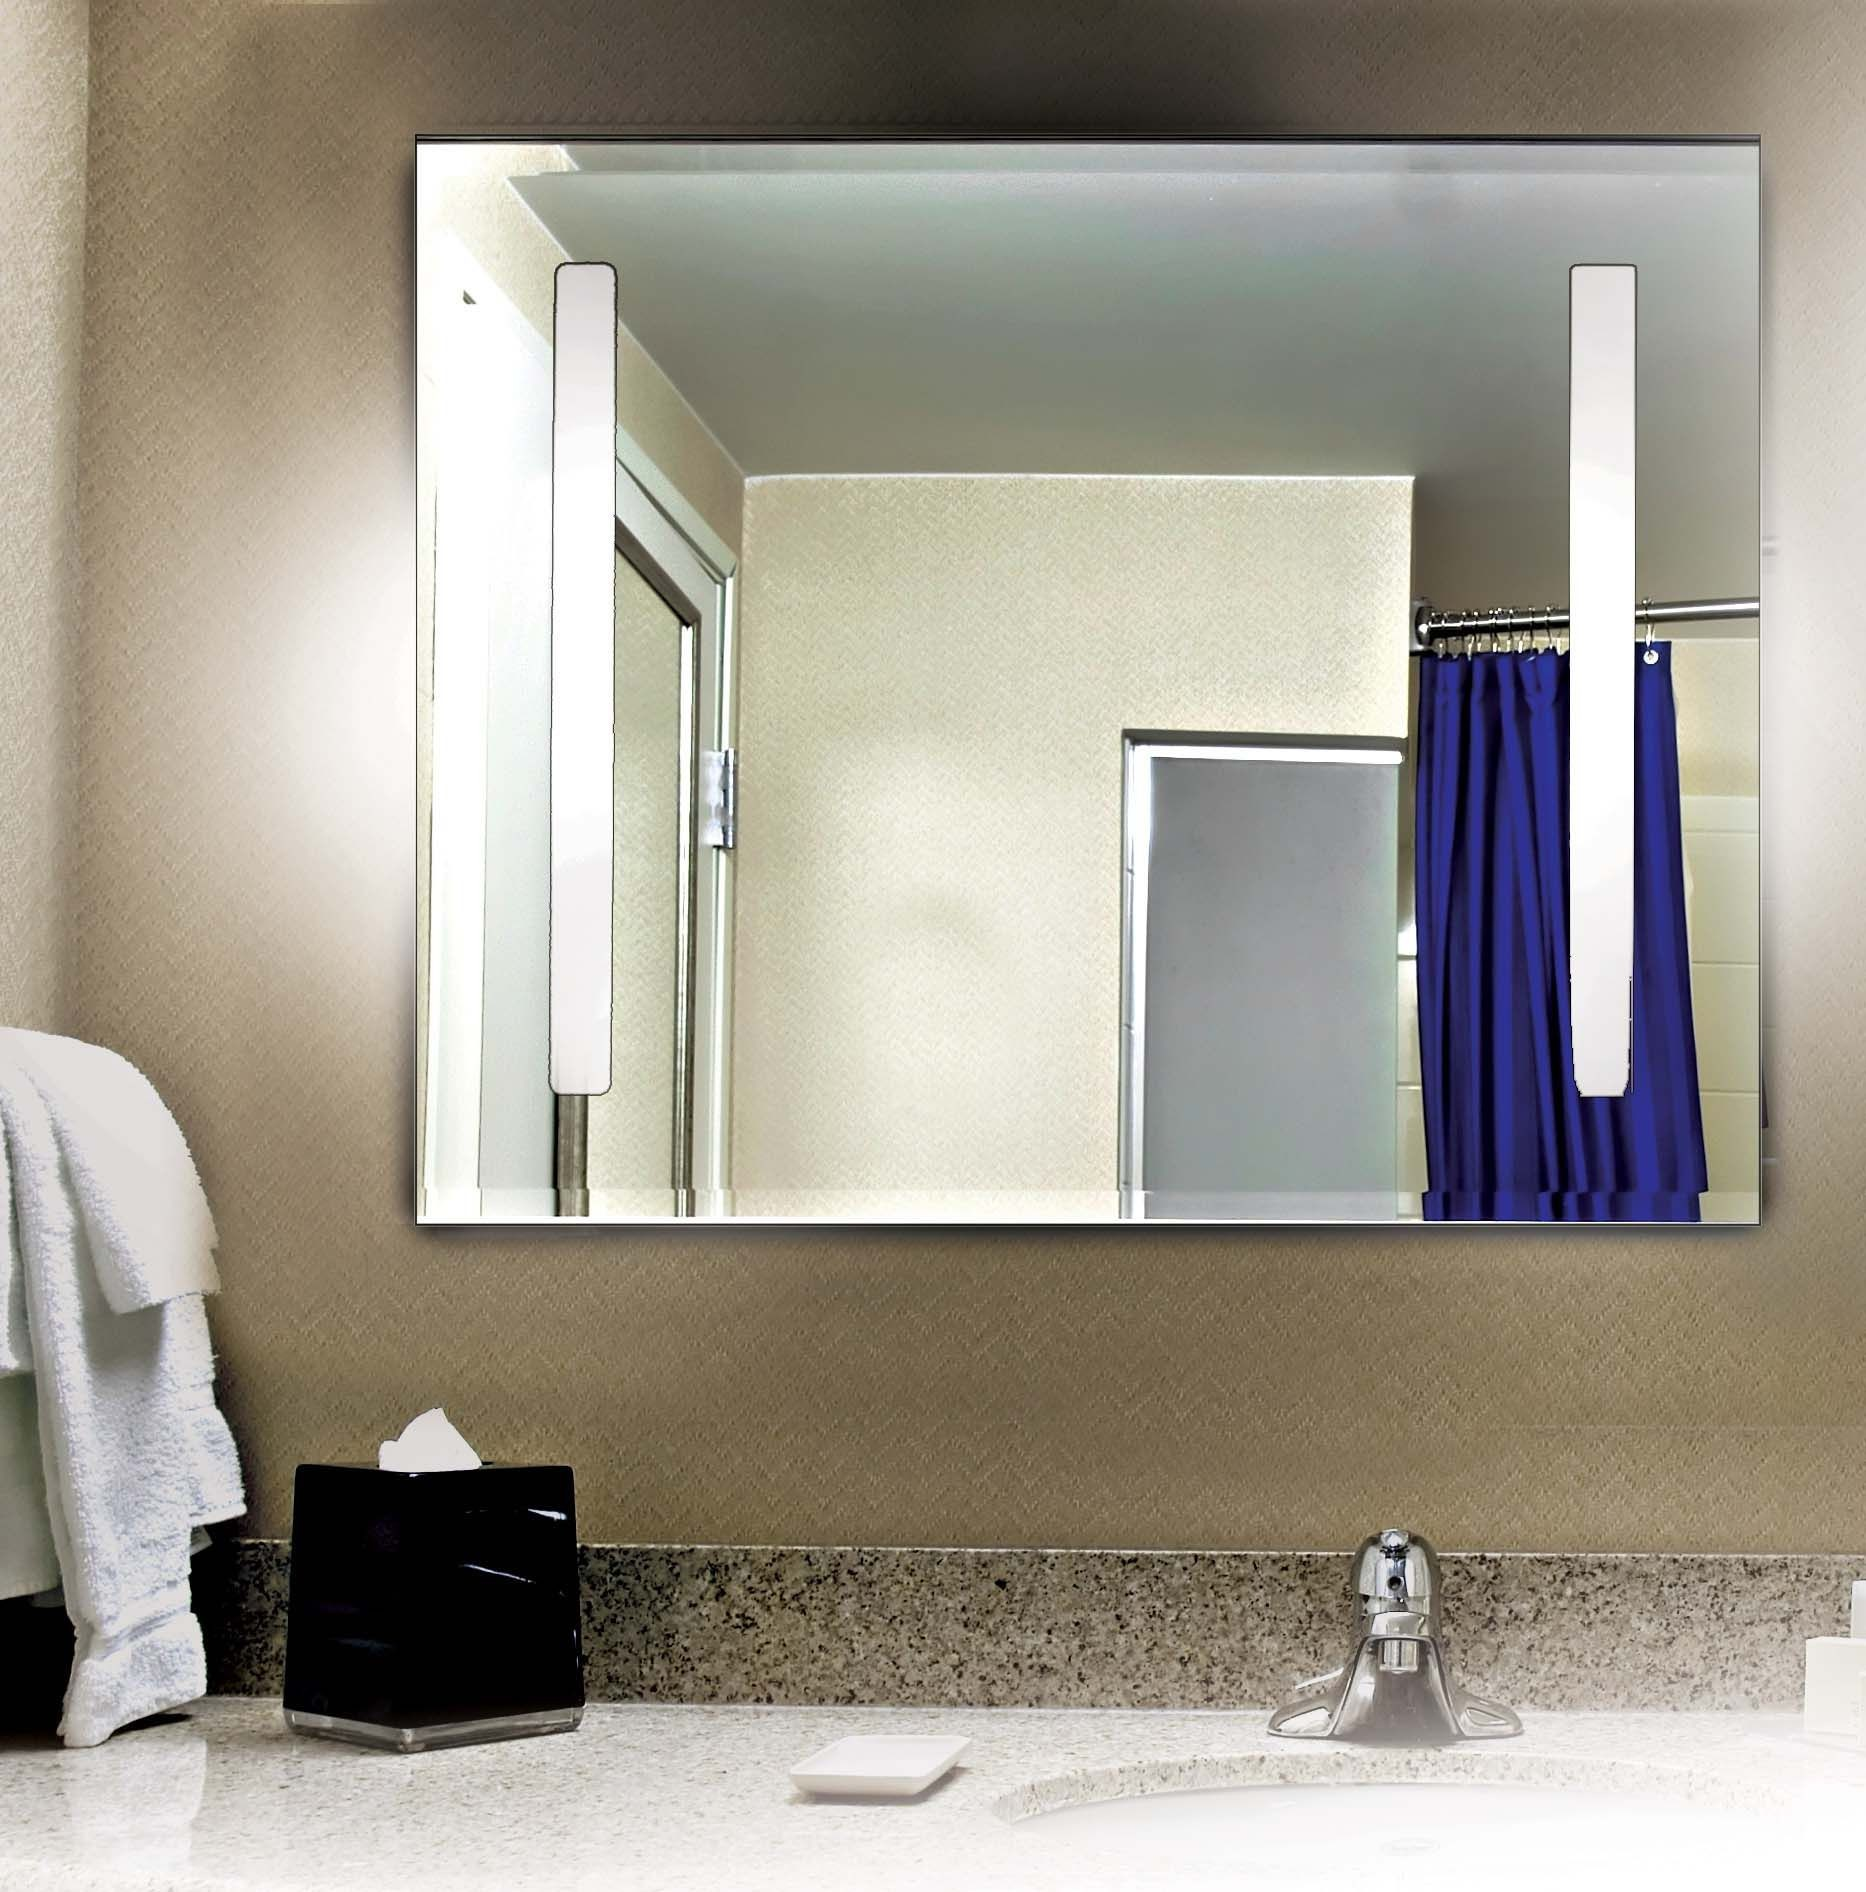 Kenroy Bathroom Vanity Light: Rifletta 2 Light Large Vanity Mirror From Kenroy (90831